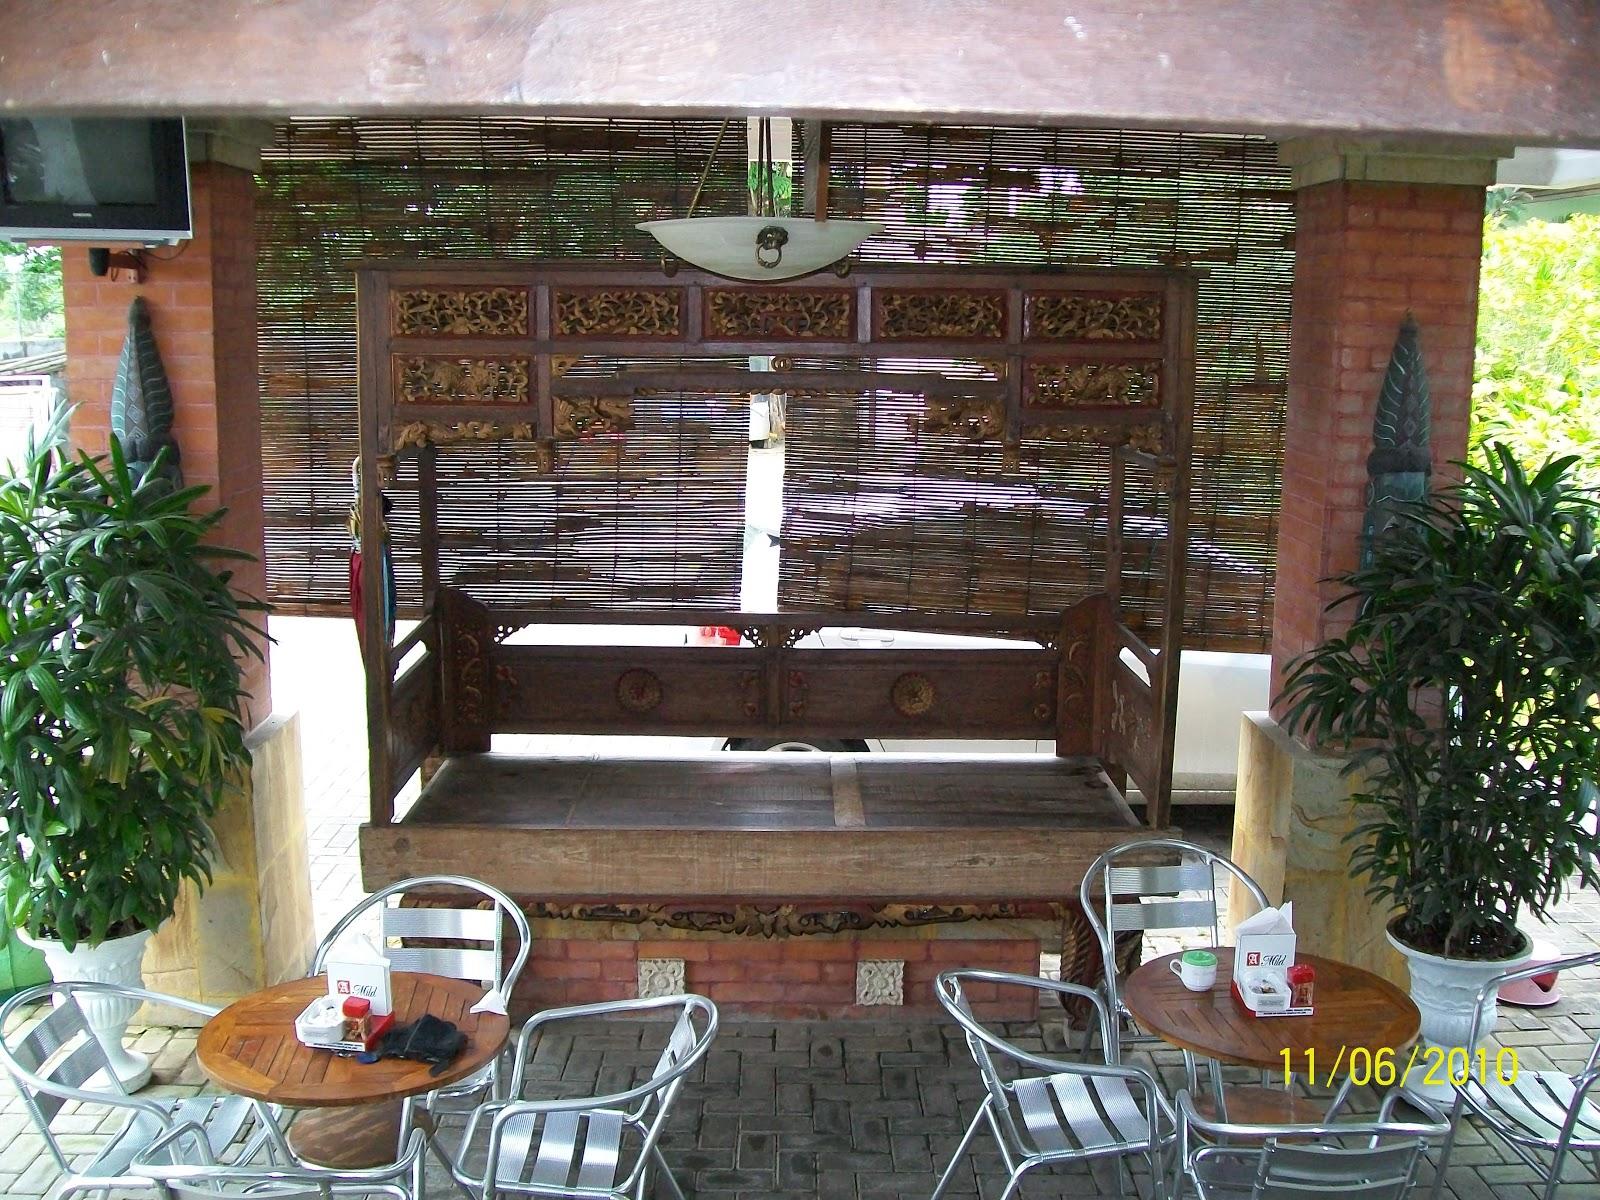 Sumber Foto HotelNewRamayana.blogspot.com